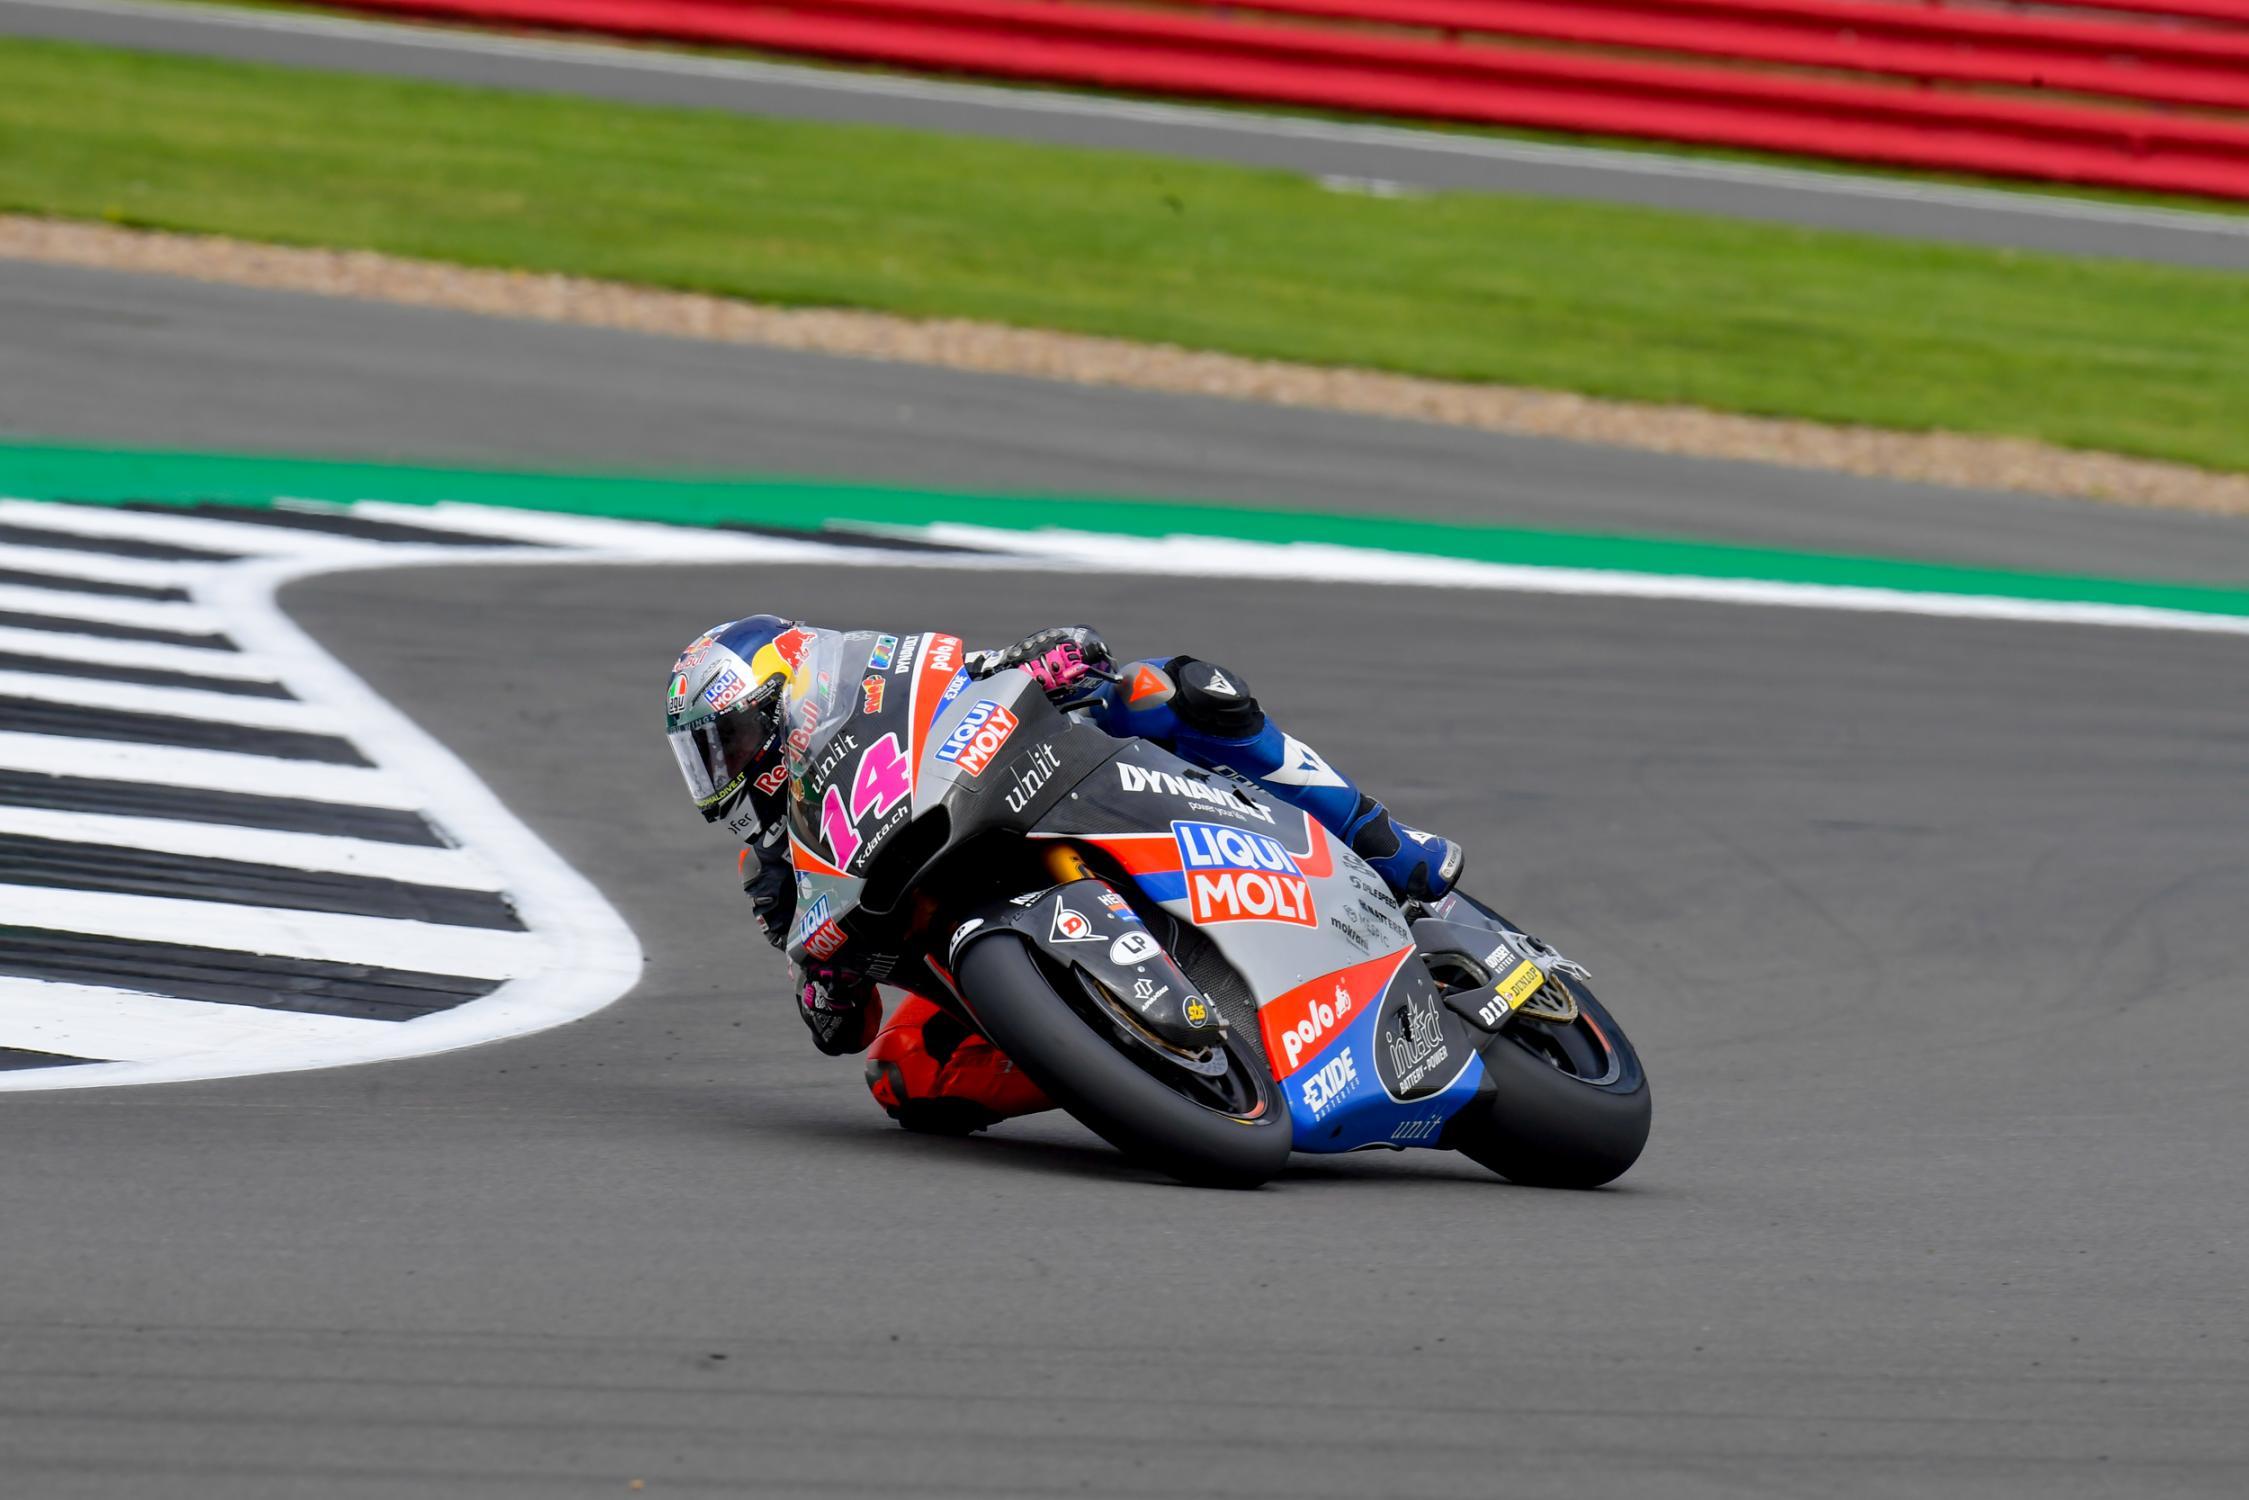 Tony Arbolino, Intact GP, Monster Energy British Grand Prix